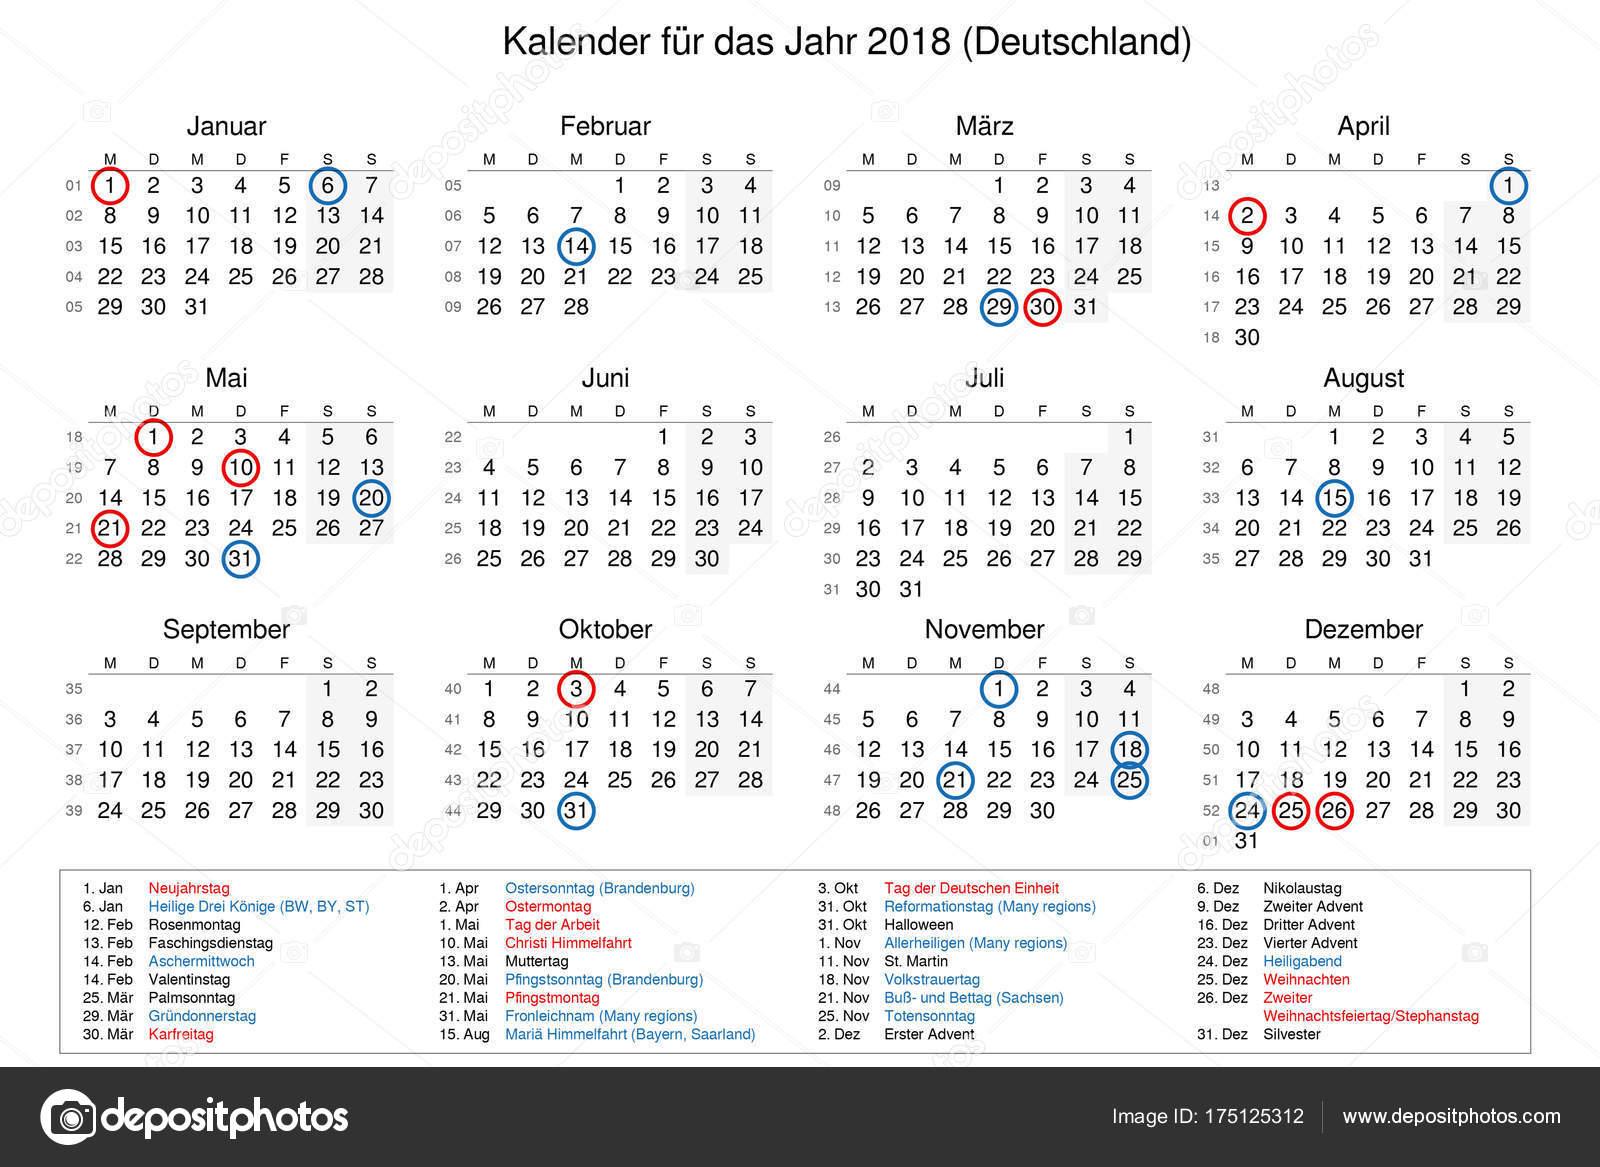 depositphotos stock photo calendar of year 2018 with